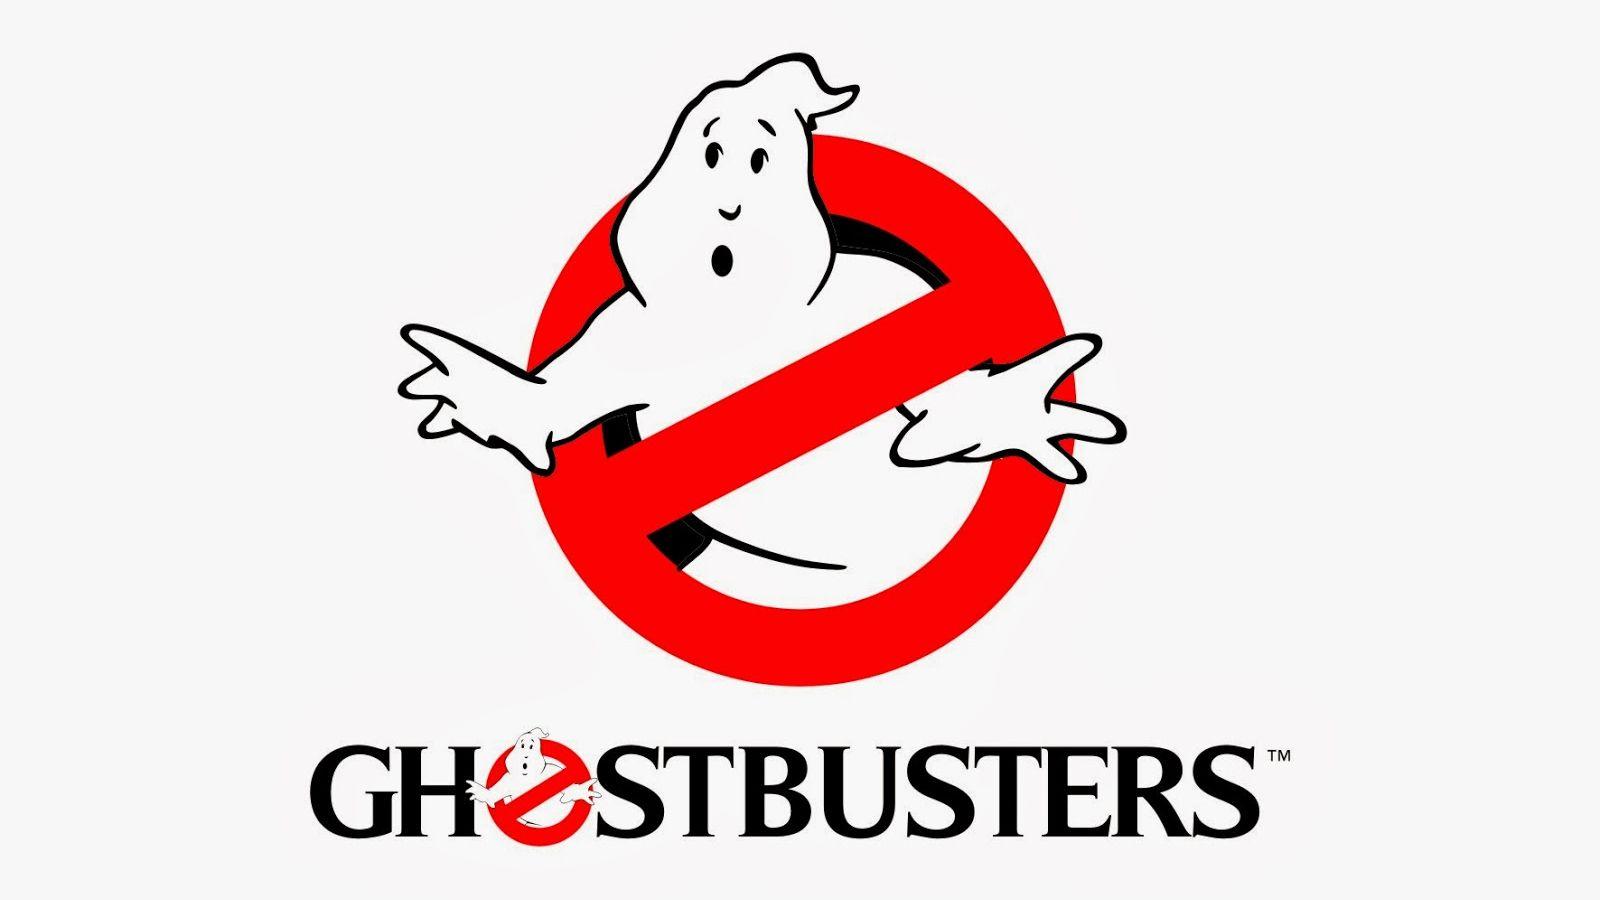 Paul Feig visar upp nya Ghostbusters bilen Ecto 1